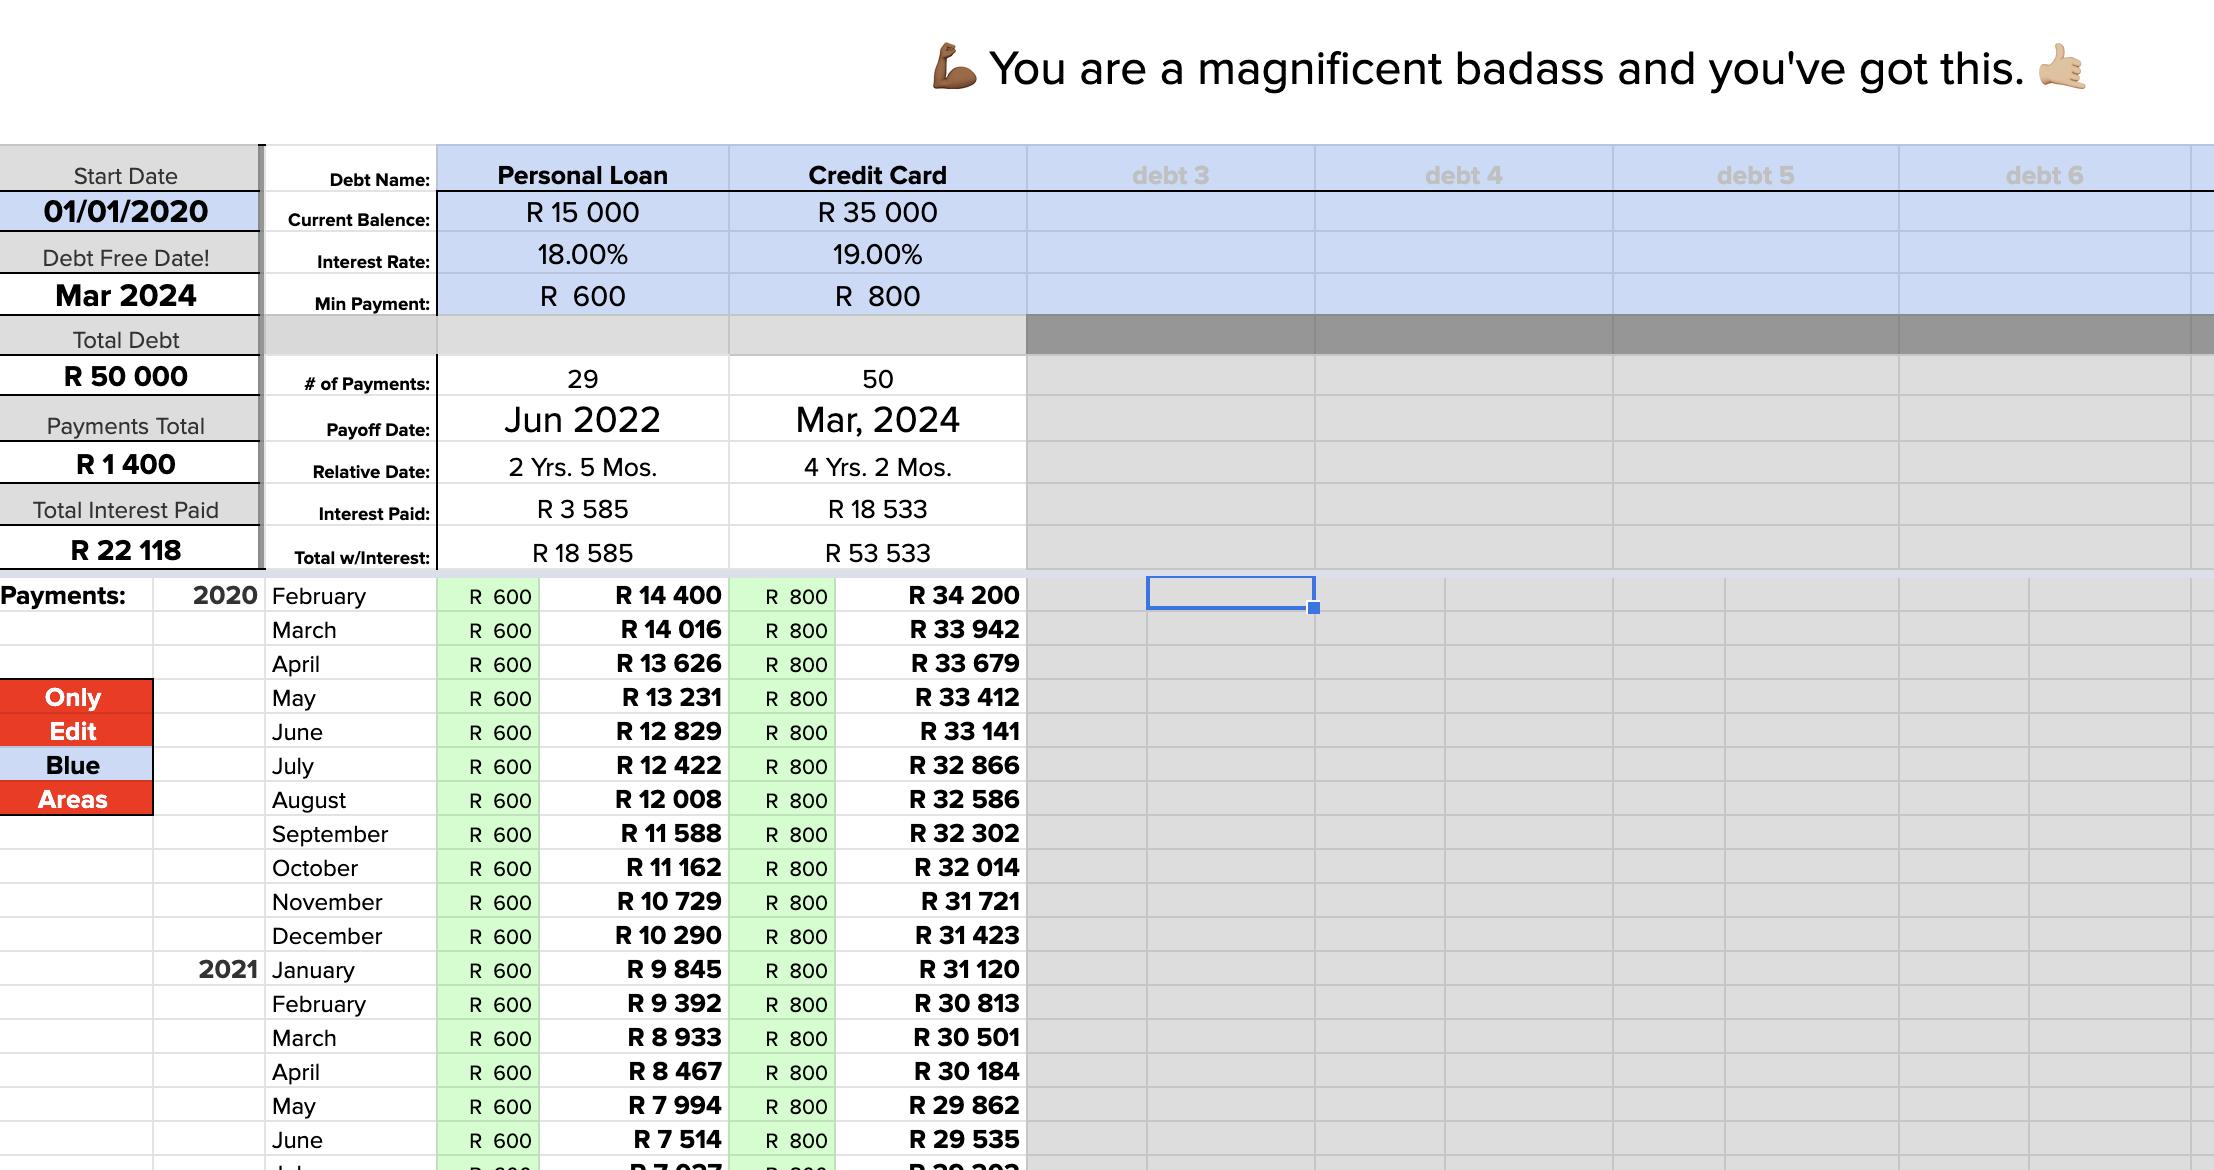 a screenshot of the debt dashboard